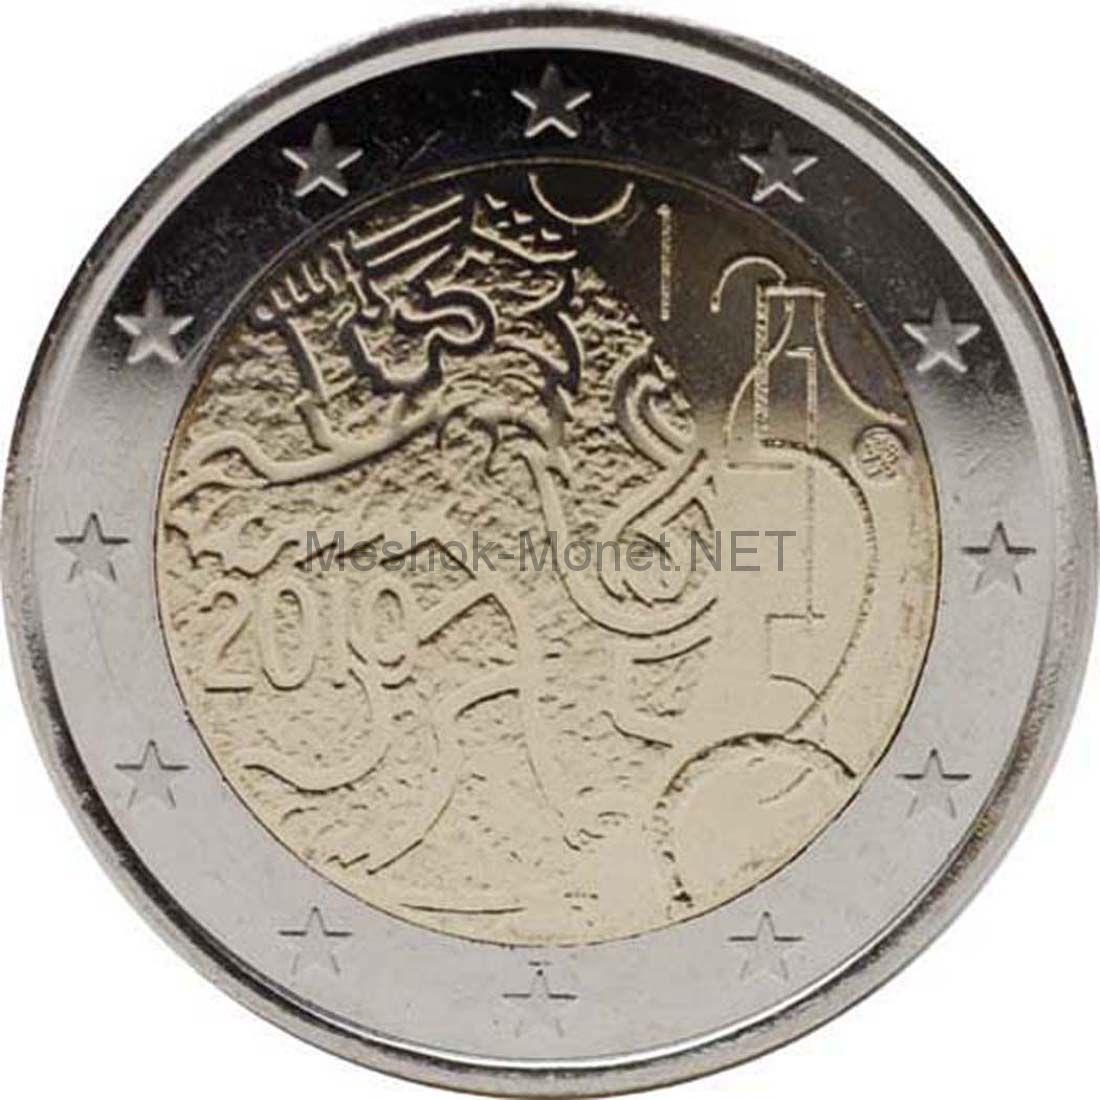 Финляндия 2 евро 2010, 150 лет марке